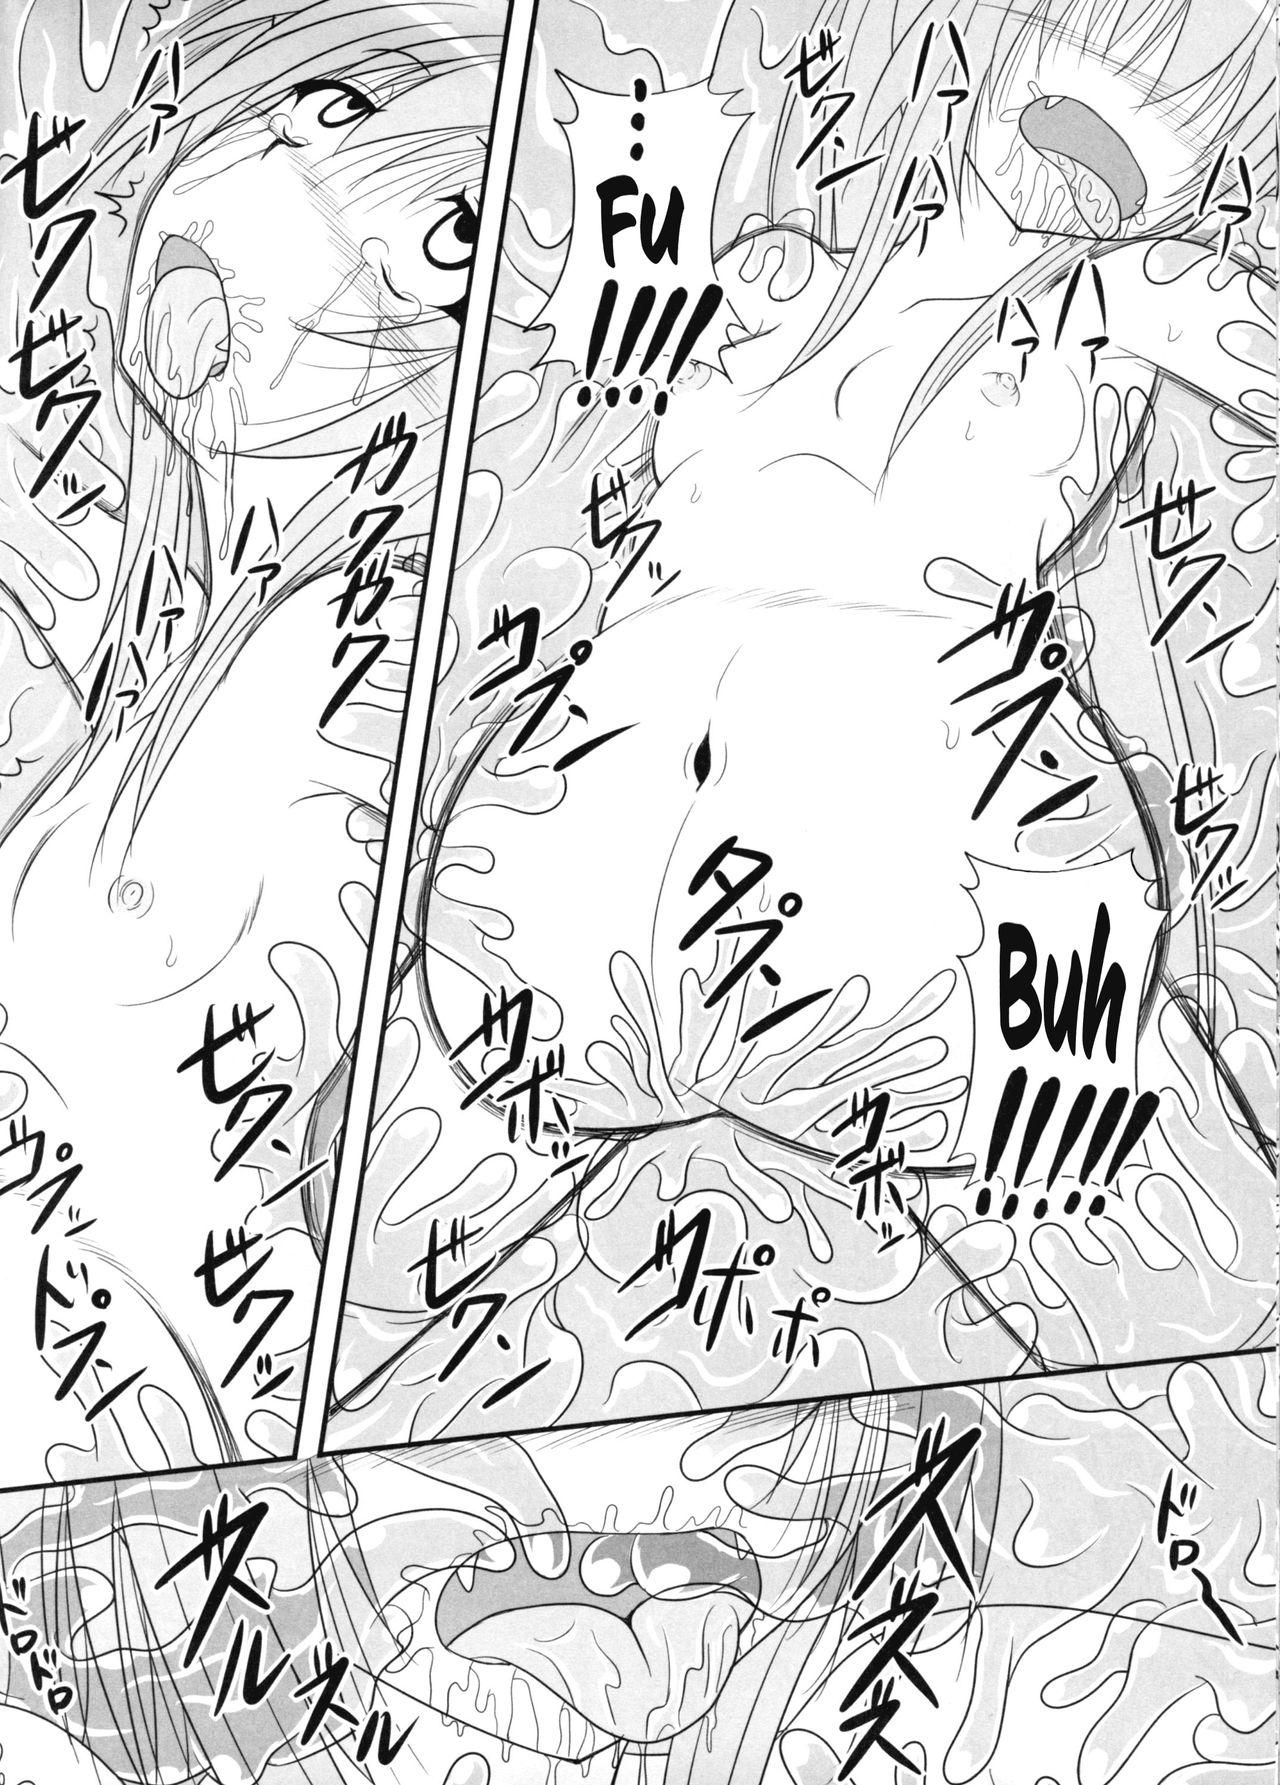 Itsuka Zenshin Funsha no Kuso Usagi | A Shitty Rabbit Gets Repeated Full Body Injections 18